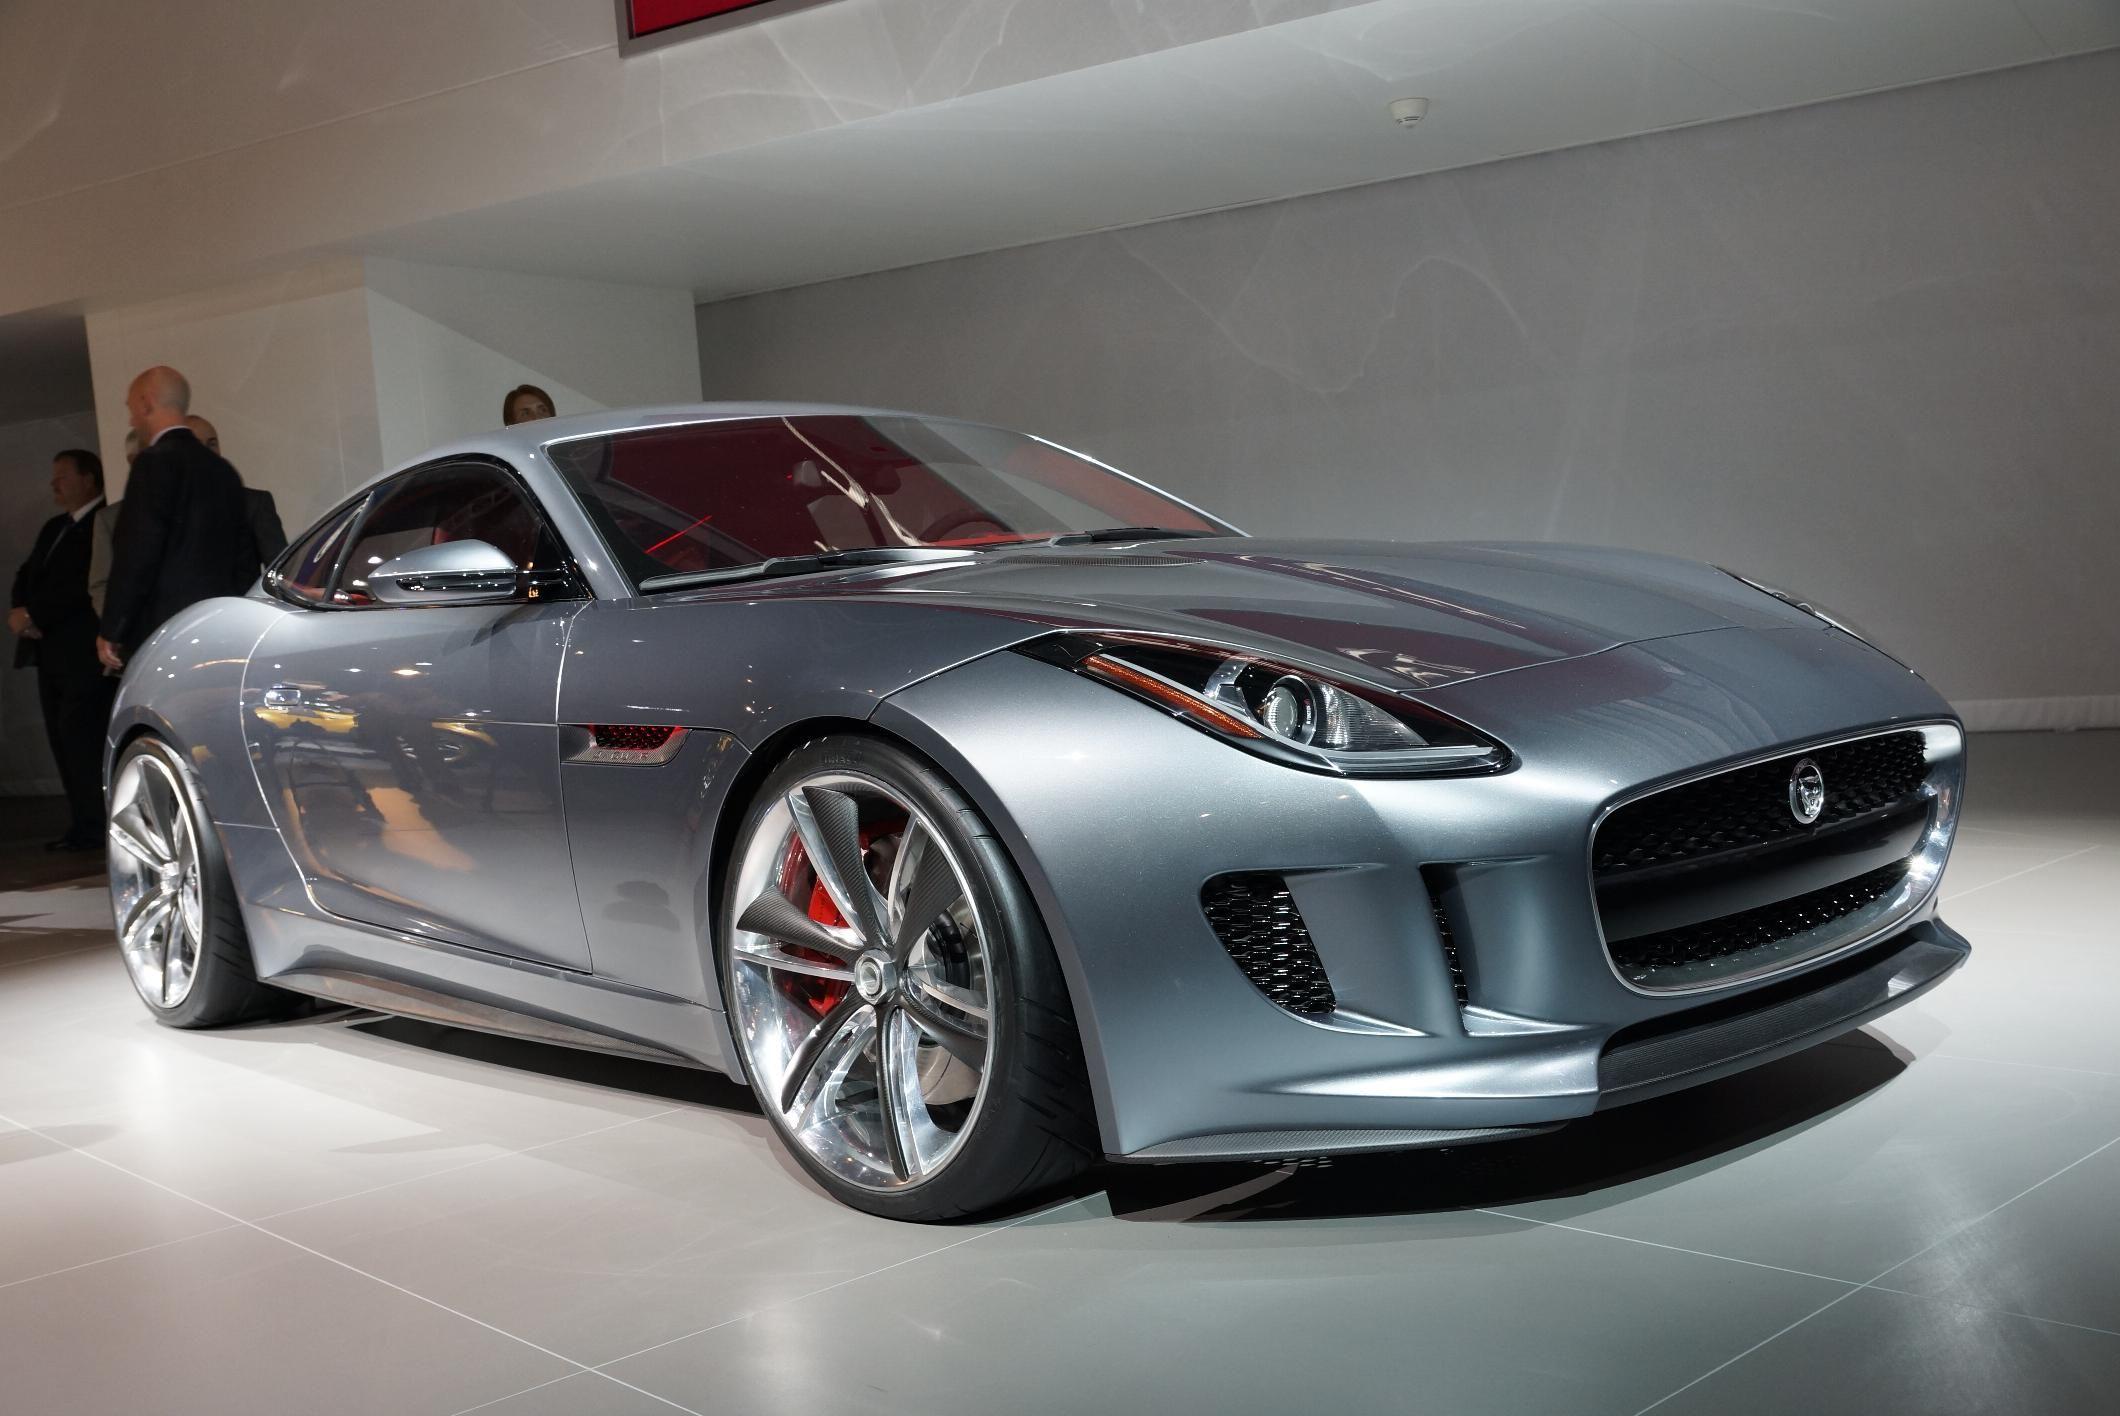 Jaguar f type news jaguar s new sports car is the f type